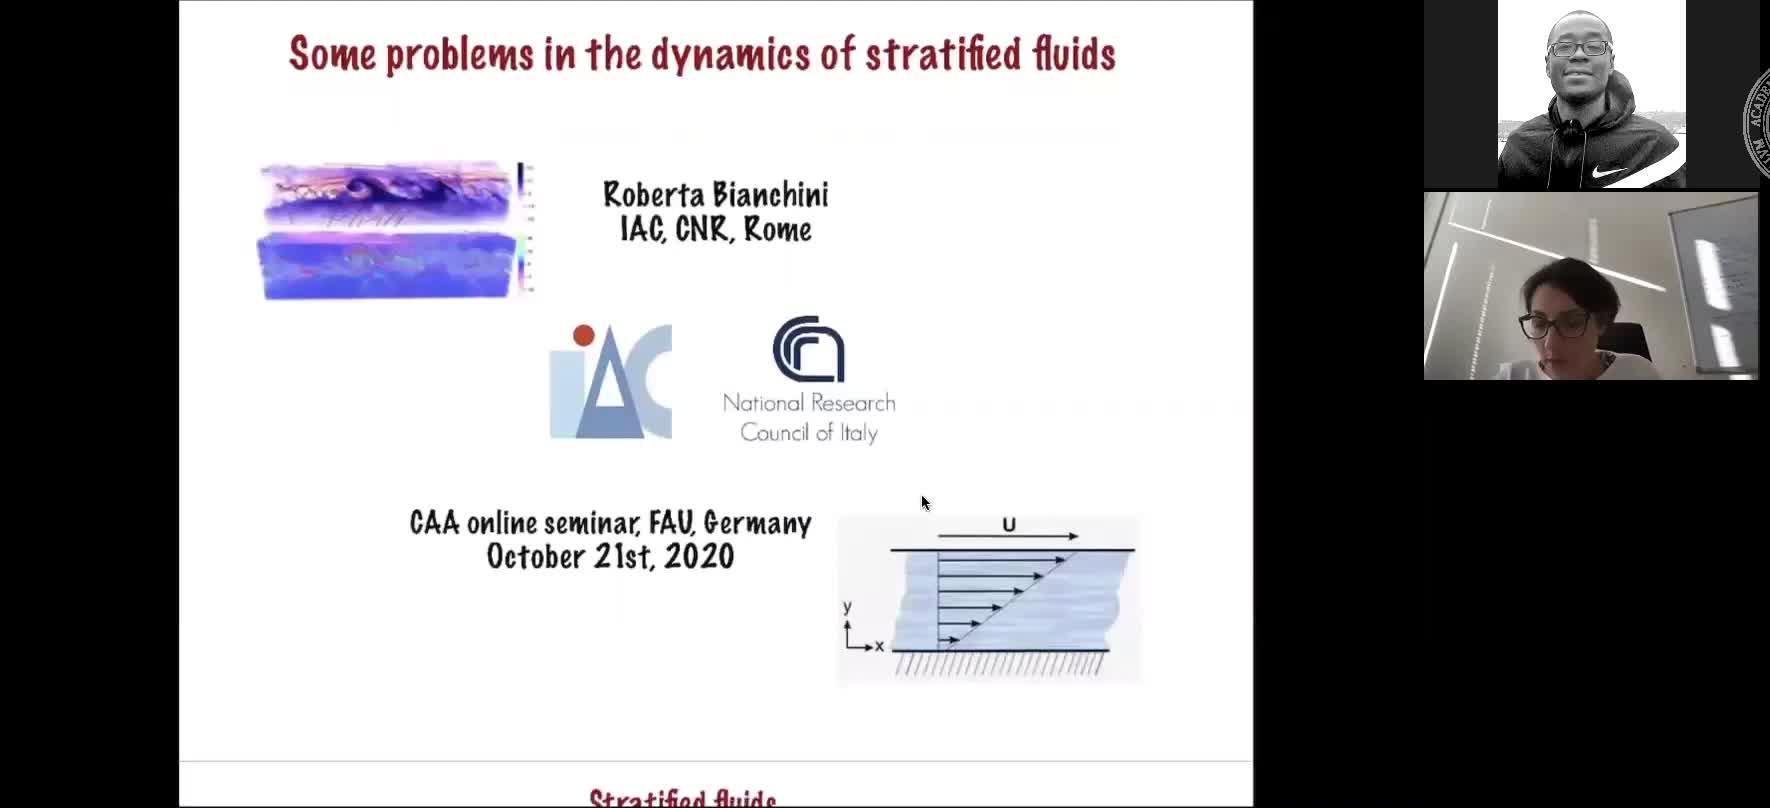 Some problems in the dynamics of stratified fluids (Roberta Bianchini, Istituto per le Applicazioni del Calcolo) preview image